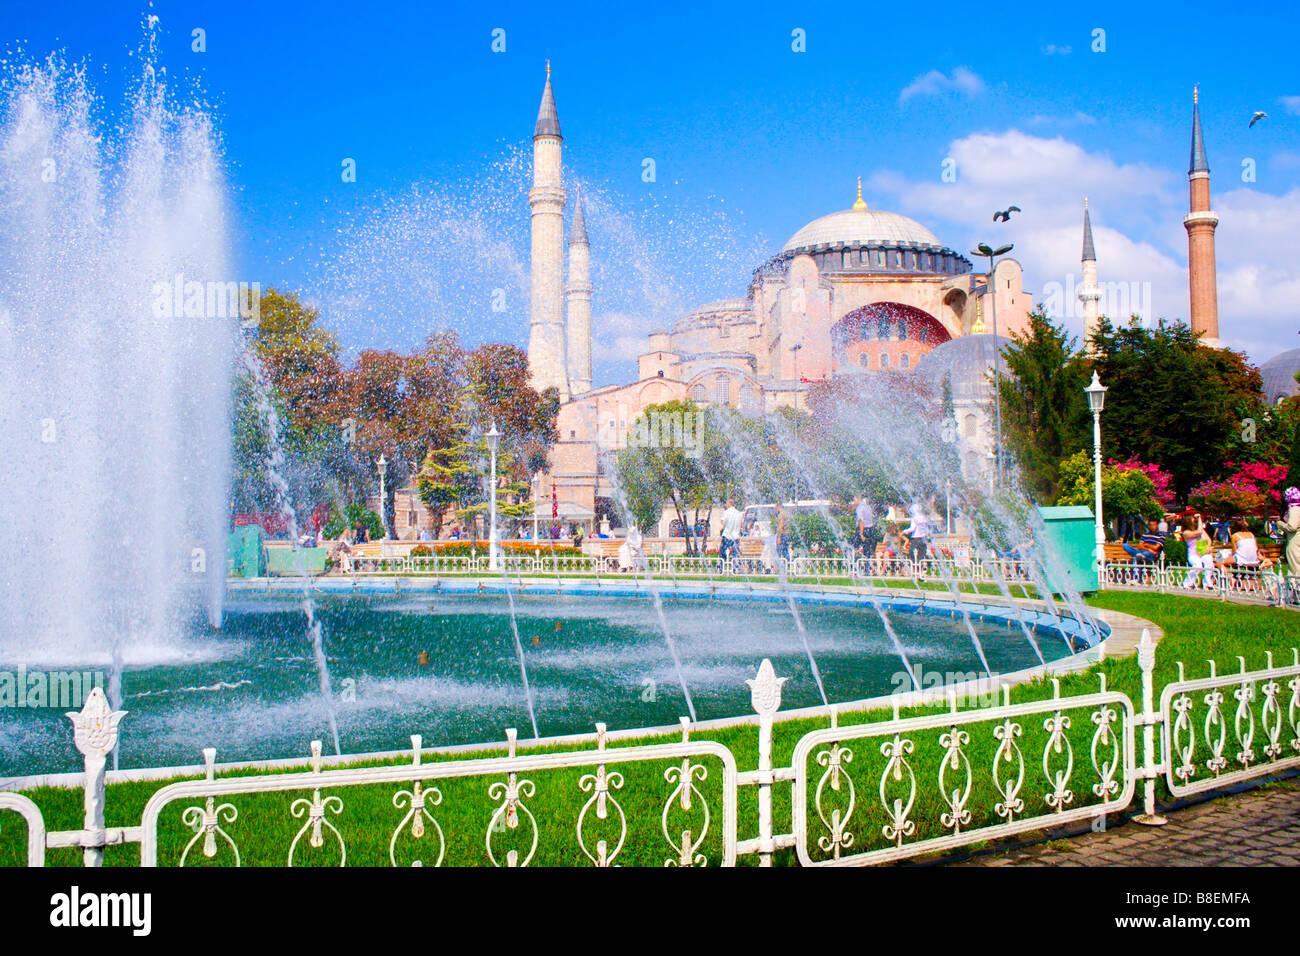 Touristic scenery Exterior view of Hagia Sophia Mosque Istanbul - Stock Image